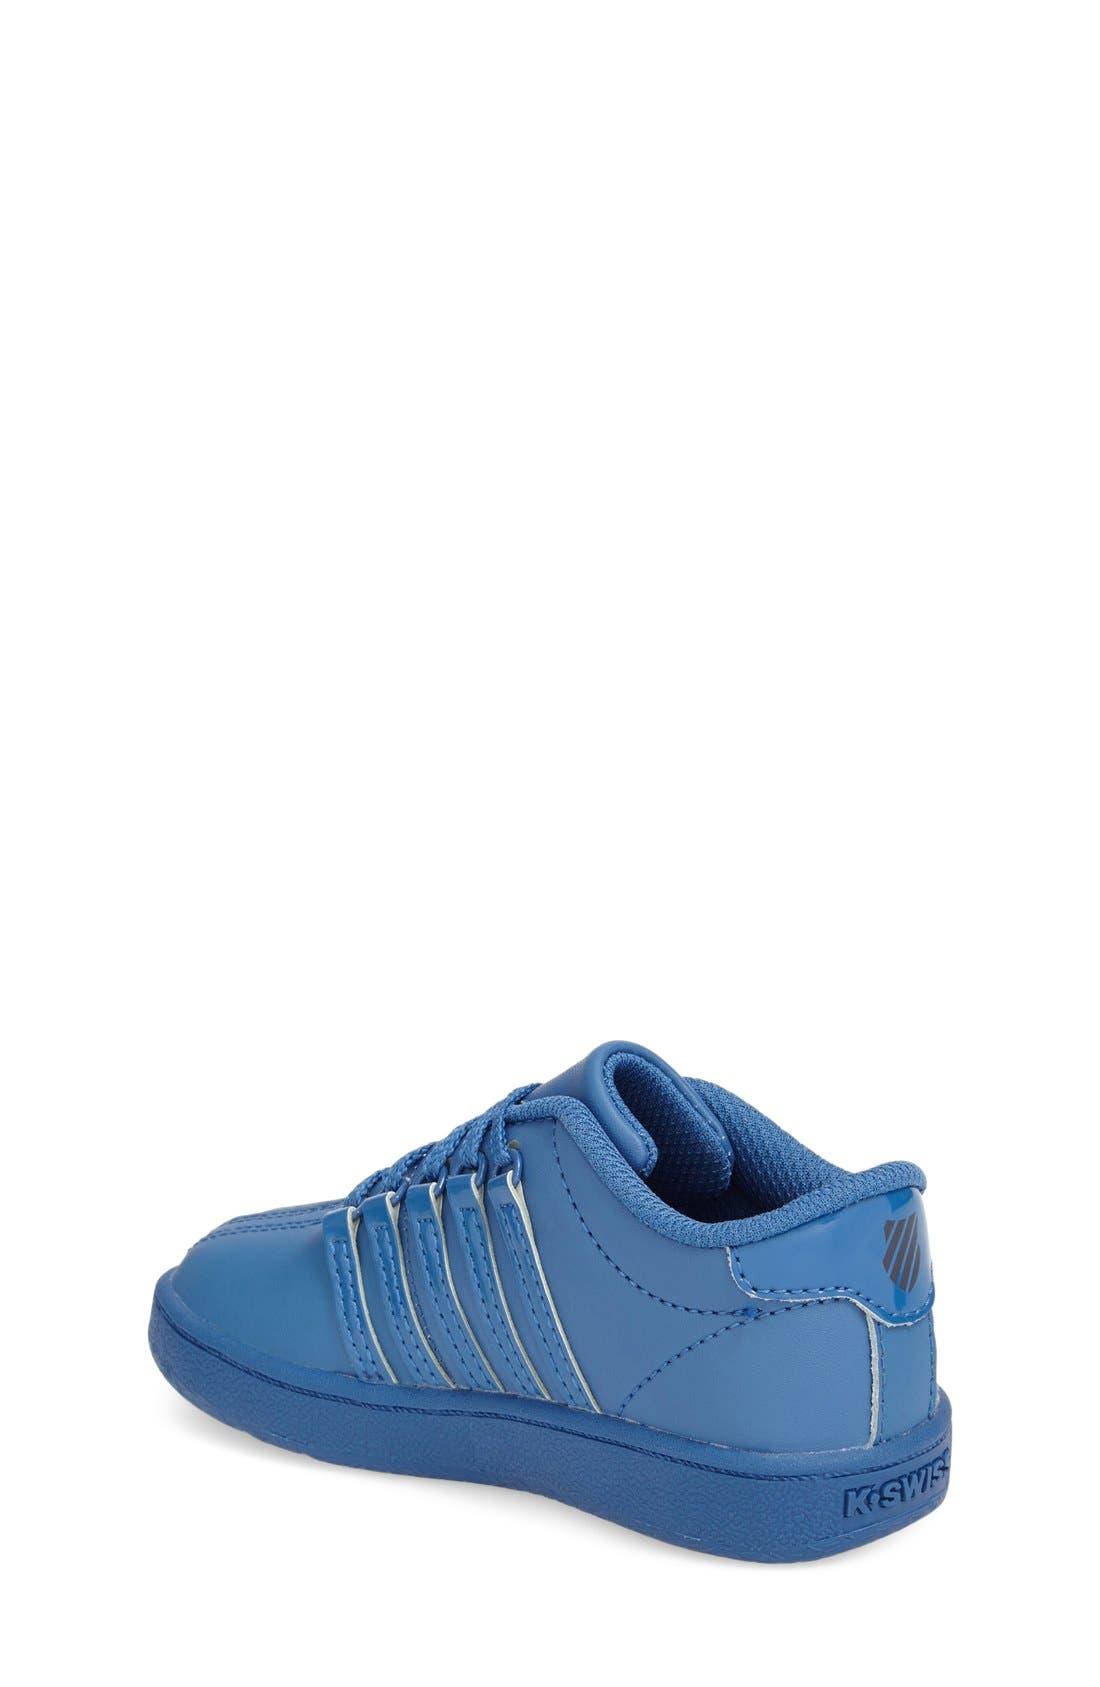 'Classic' Sneaker,                             Alternate thumbnail 28, color,